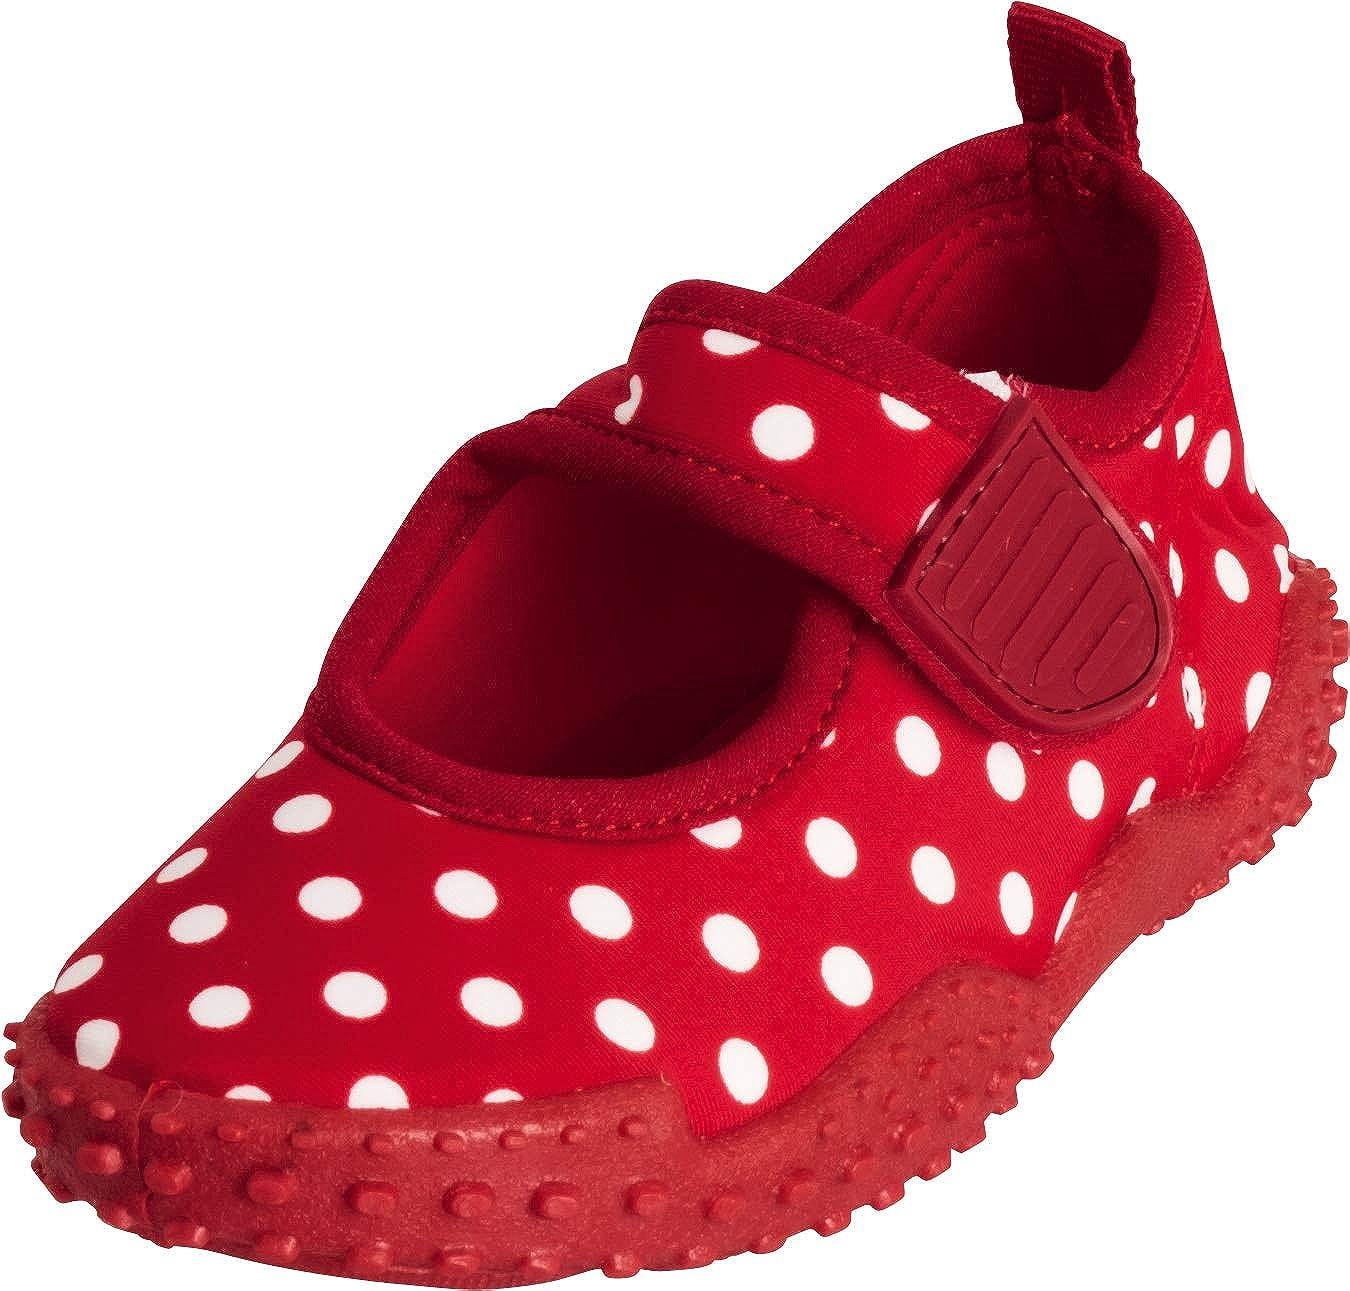 Beach /& Pool Shoes Playshoes Girls UV Protection Aqua Shoe Dots